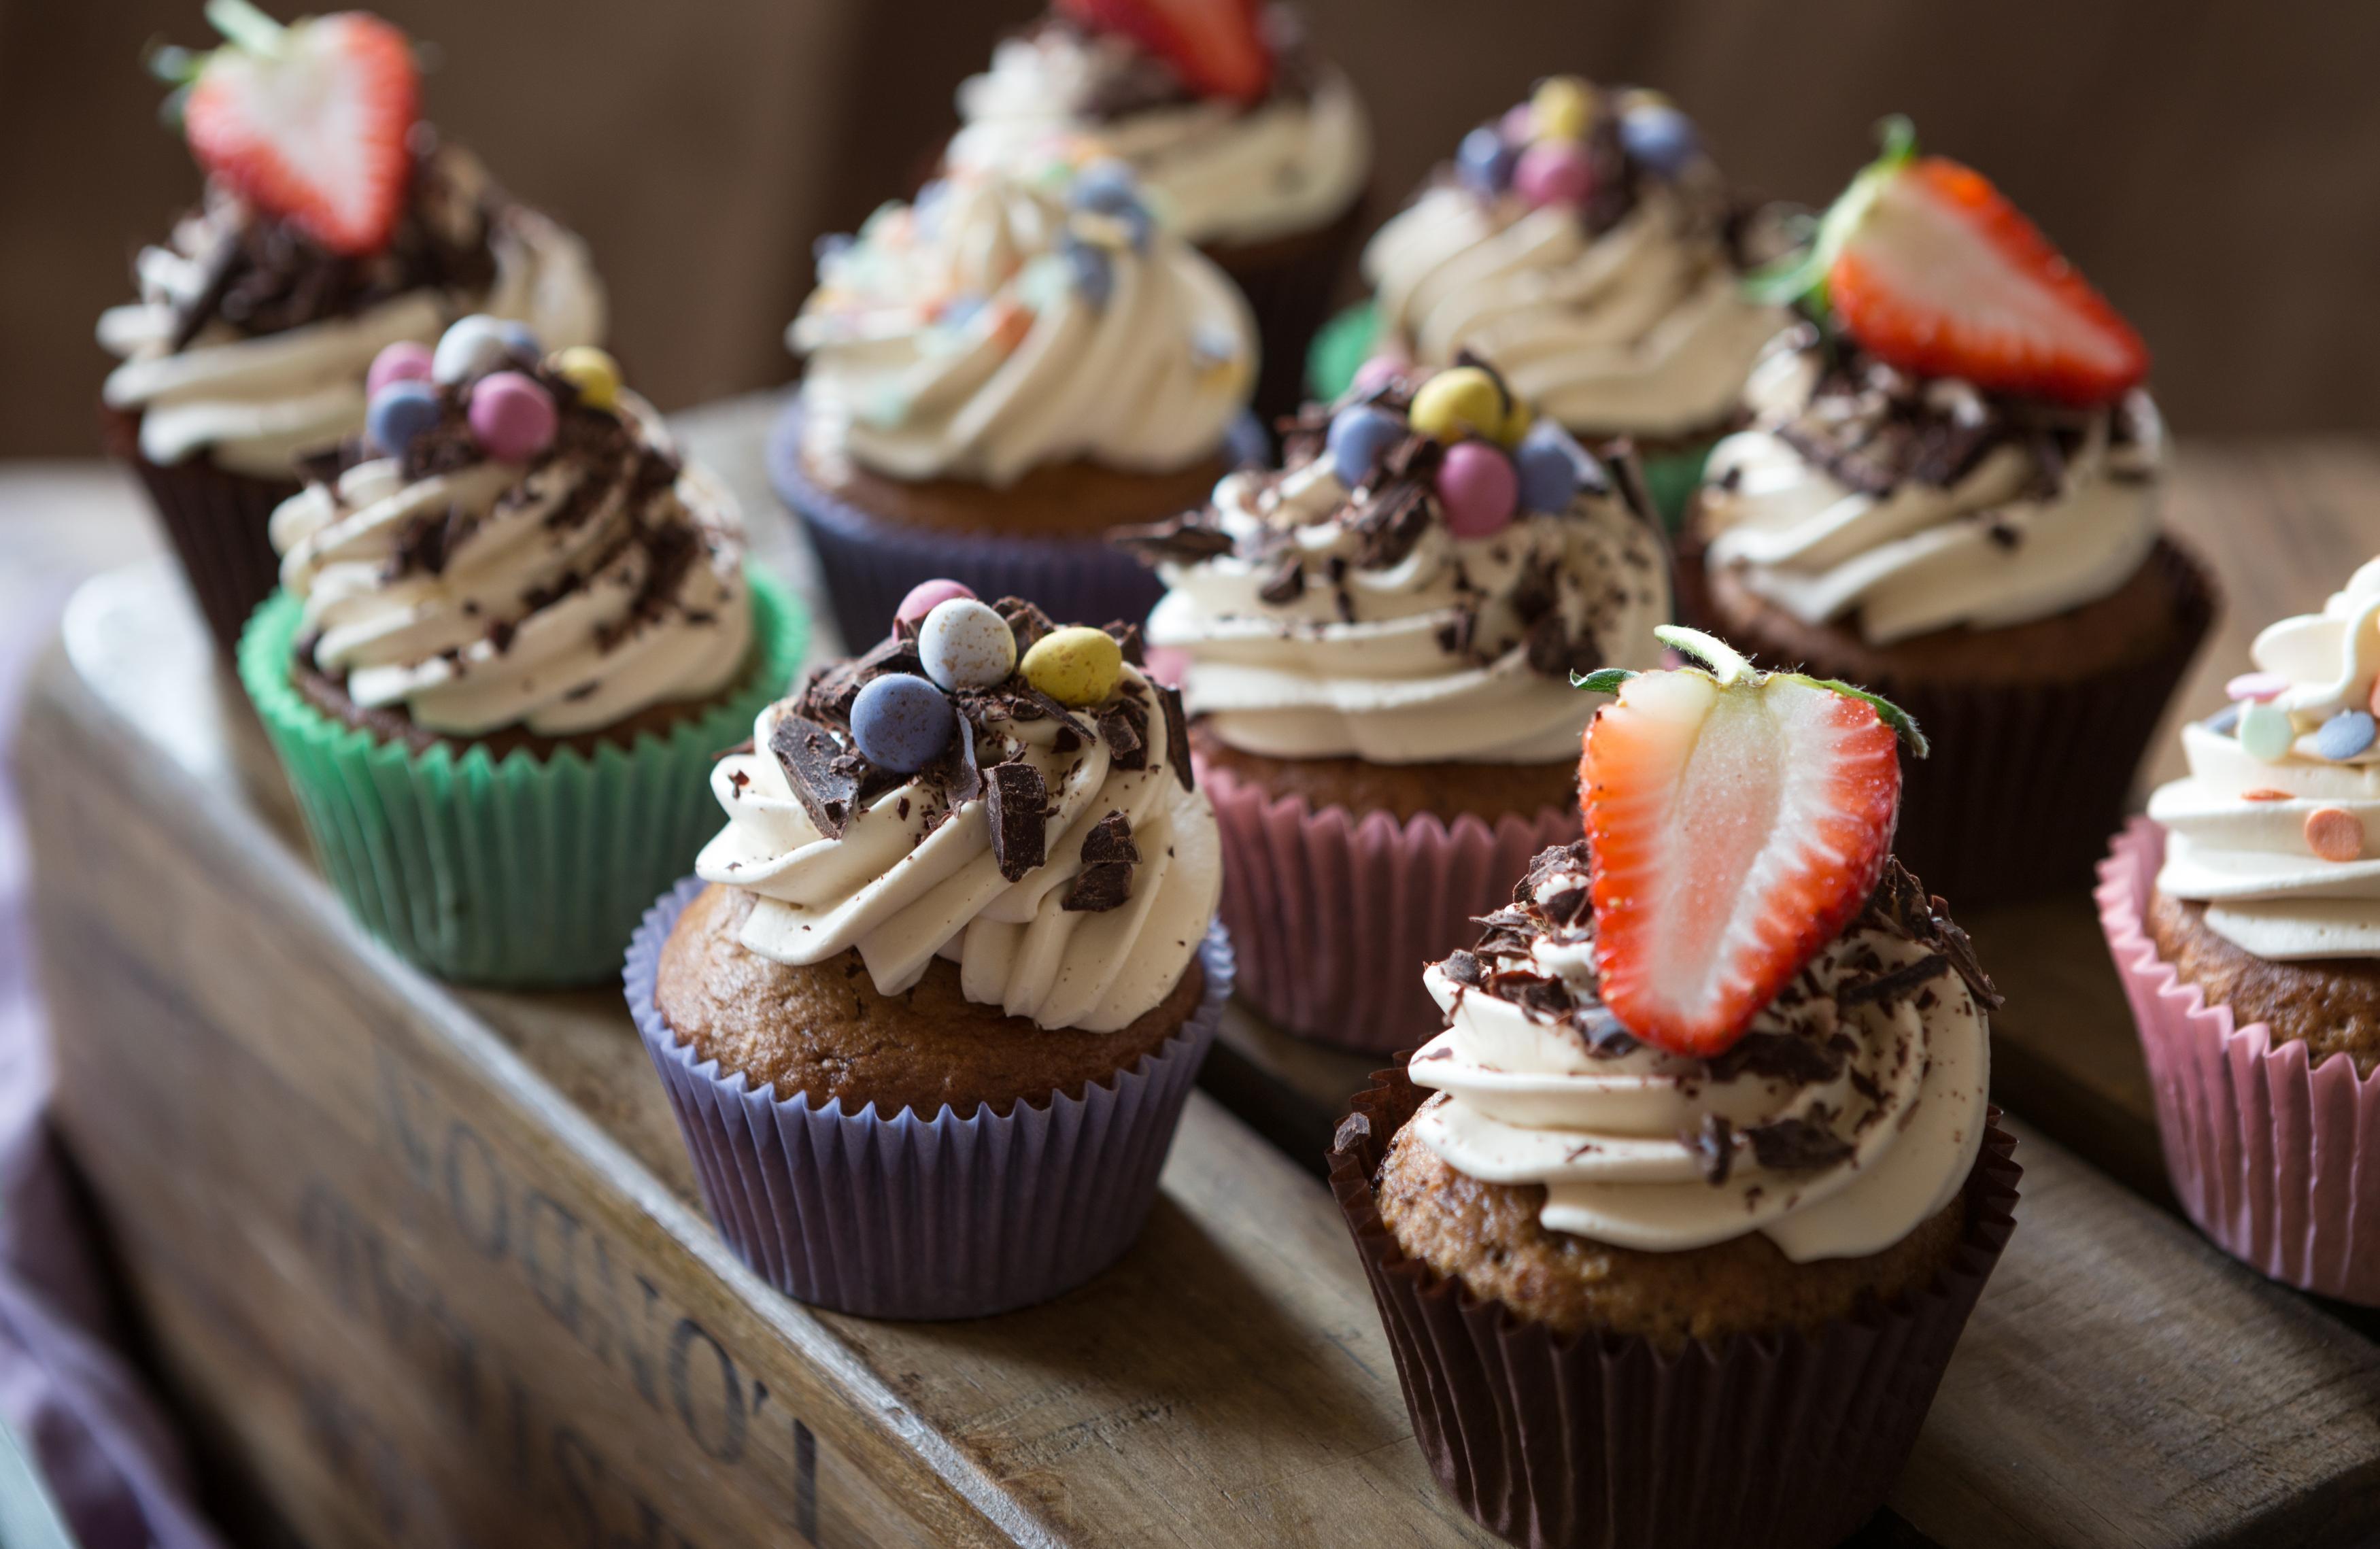 Easter Coffee & Chocolate Cupcakes Miss Tortology E17 Artisan Cakes Maya Sapone